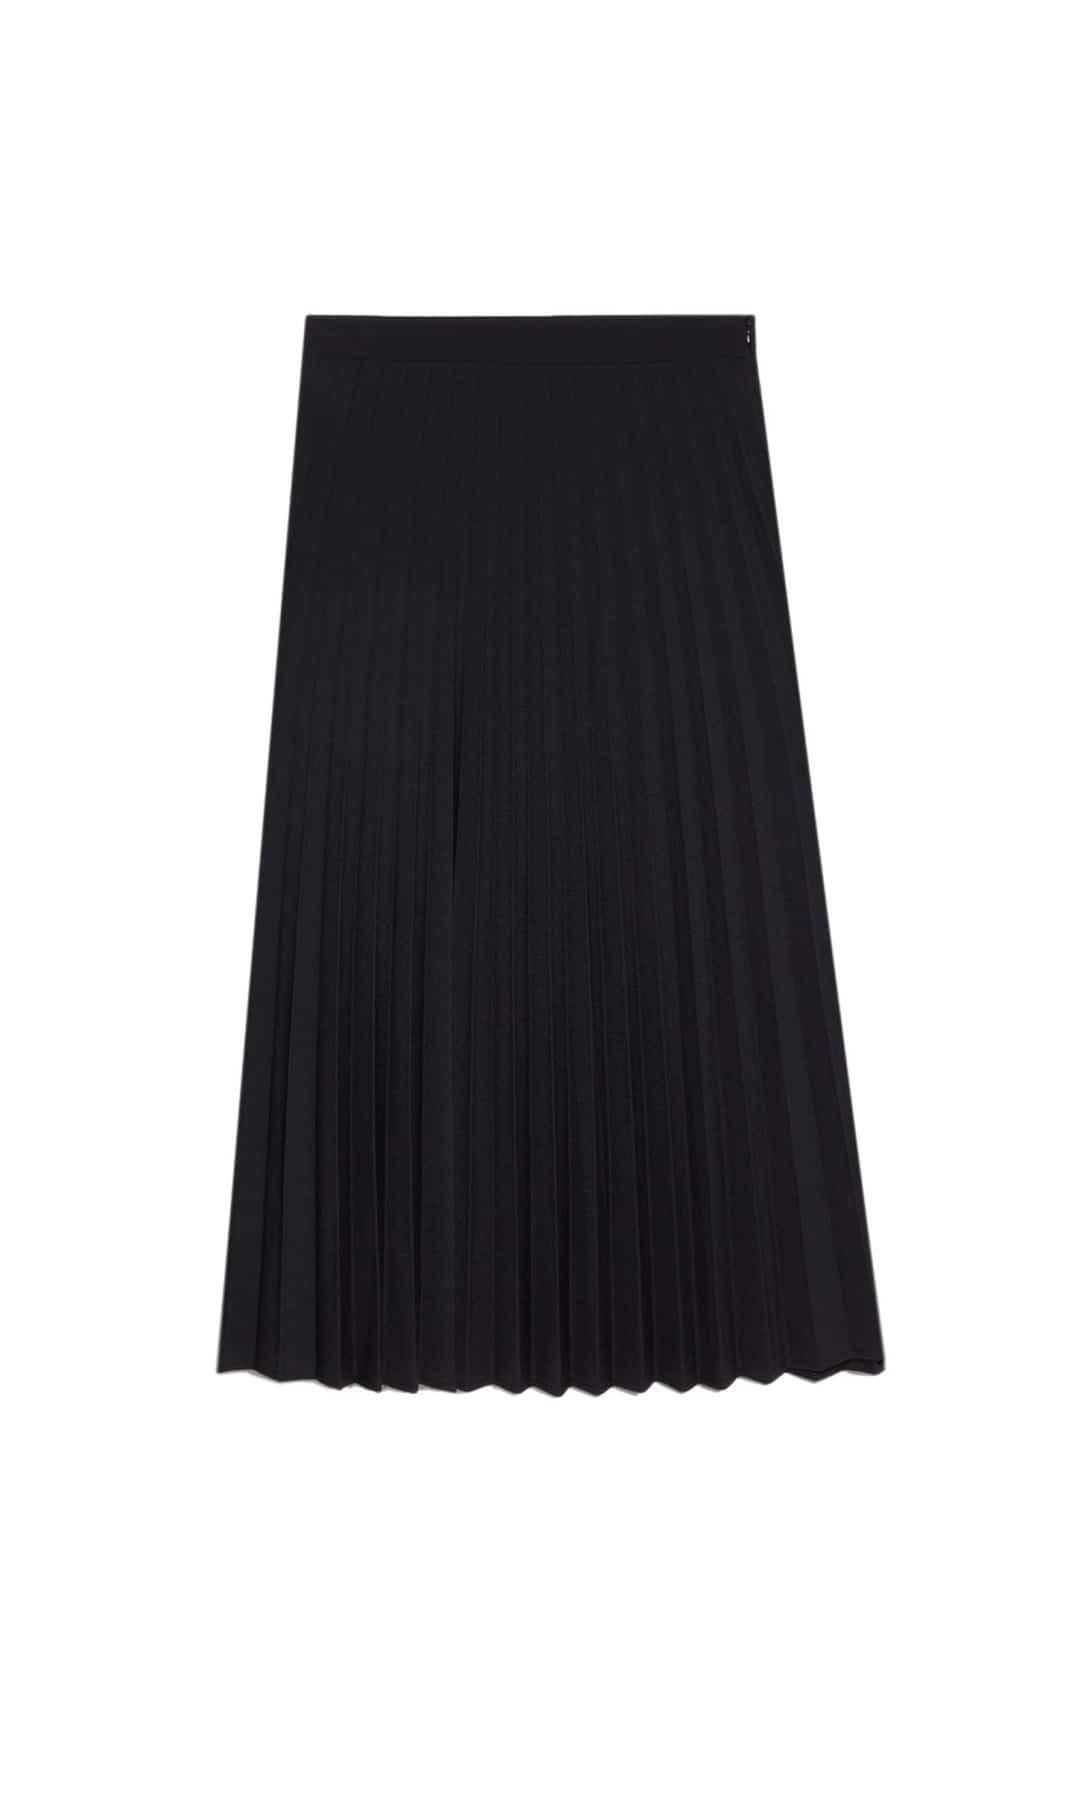 Falda negra plisada básica